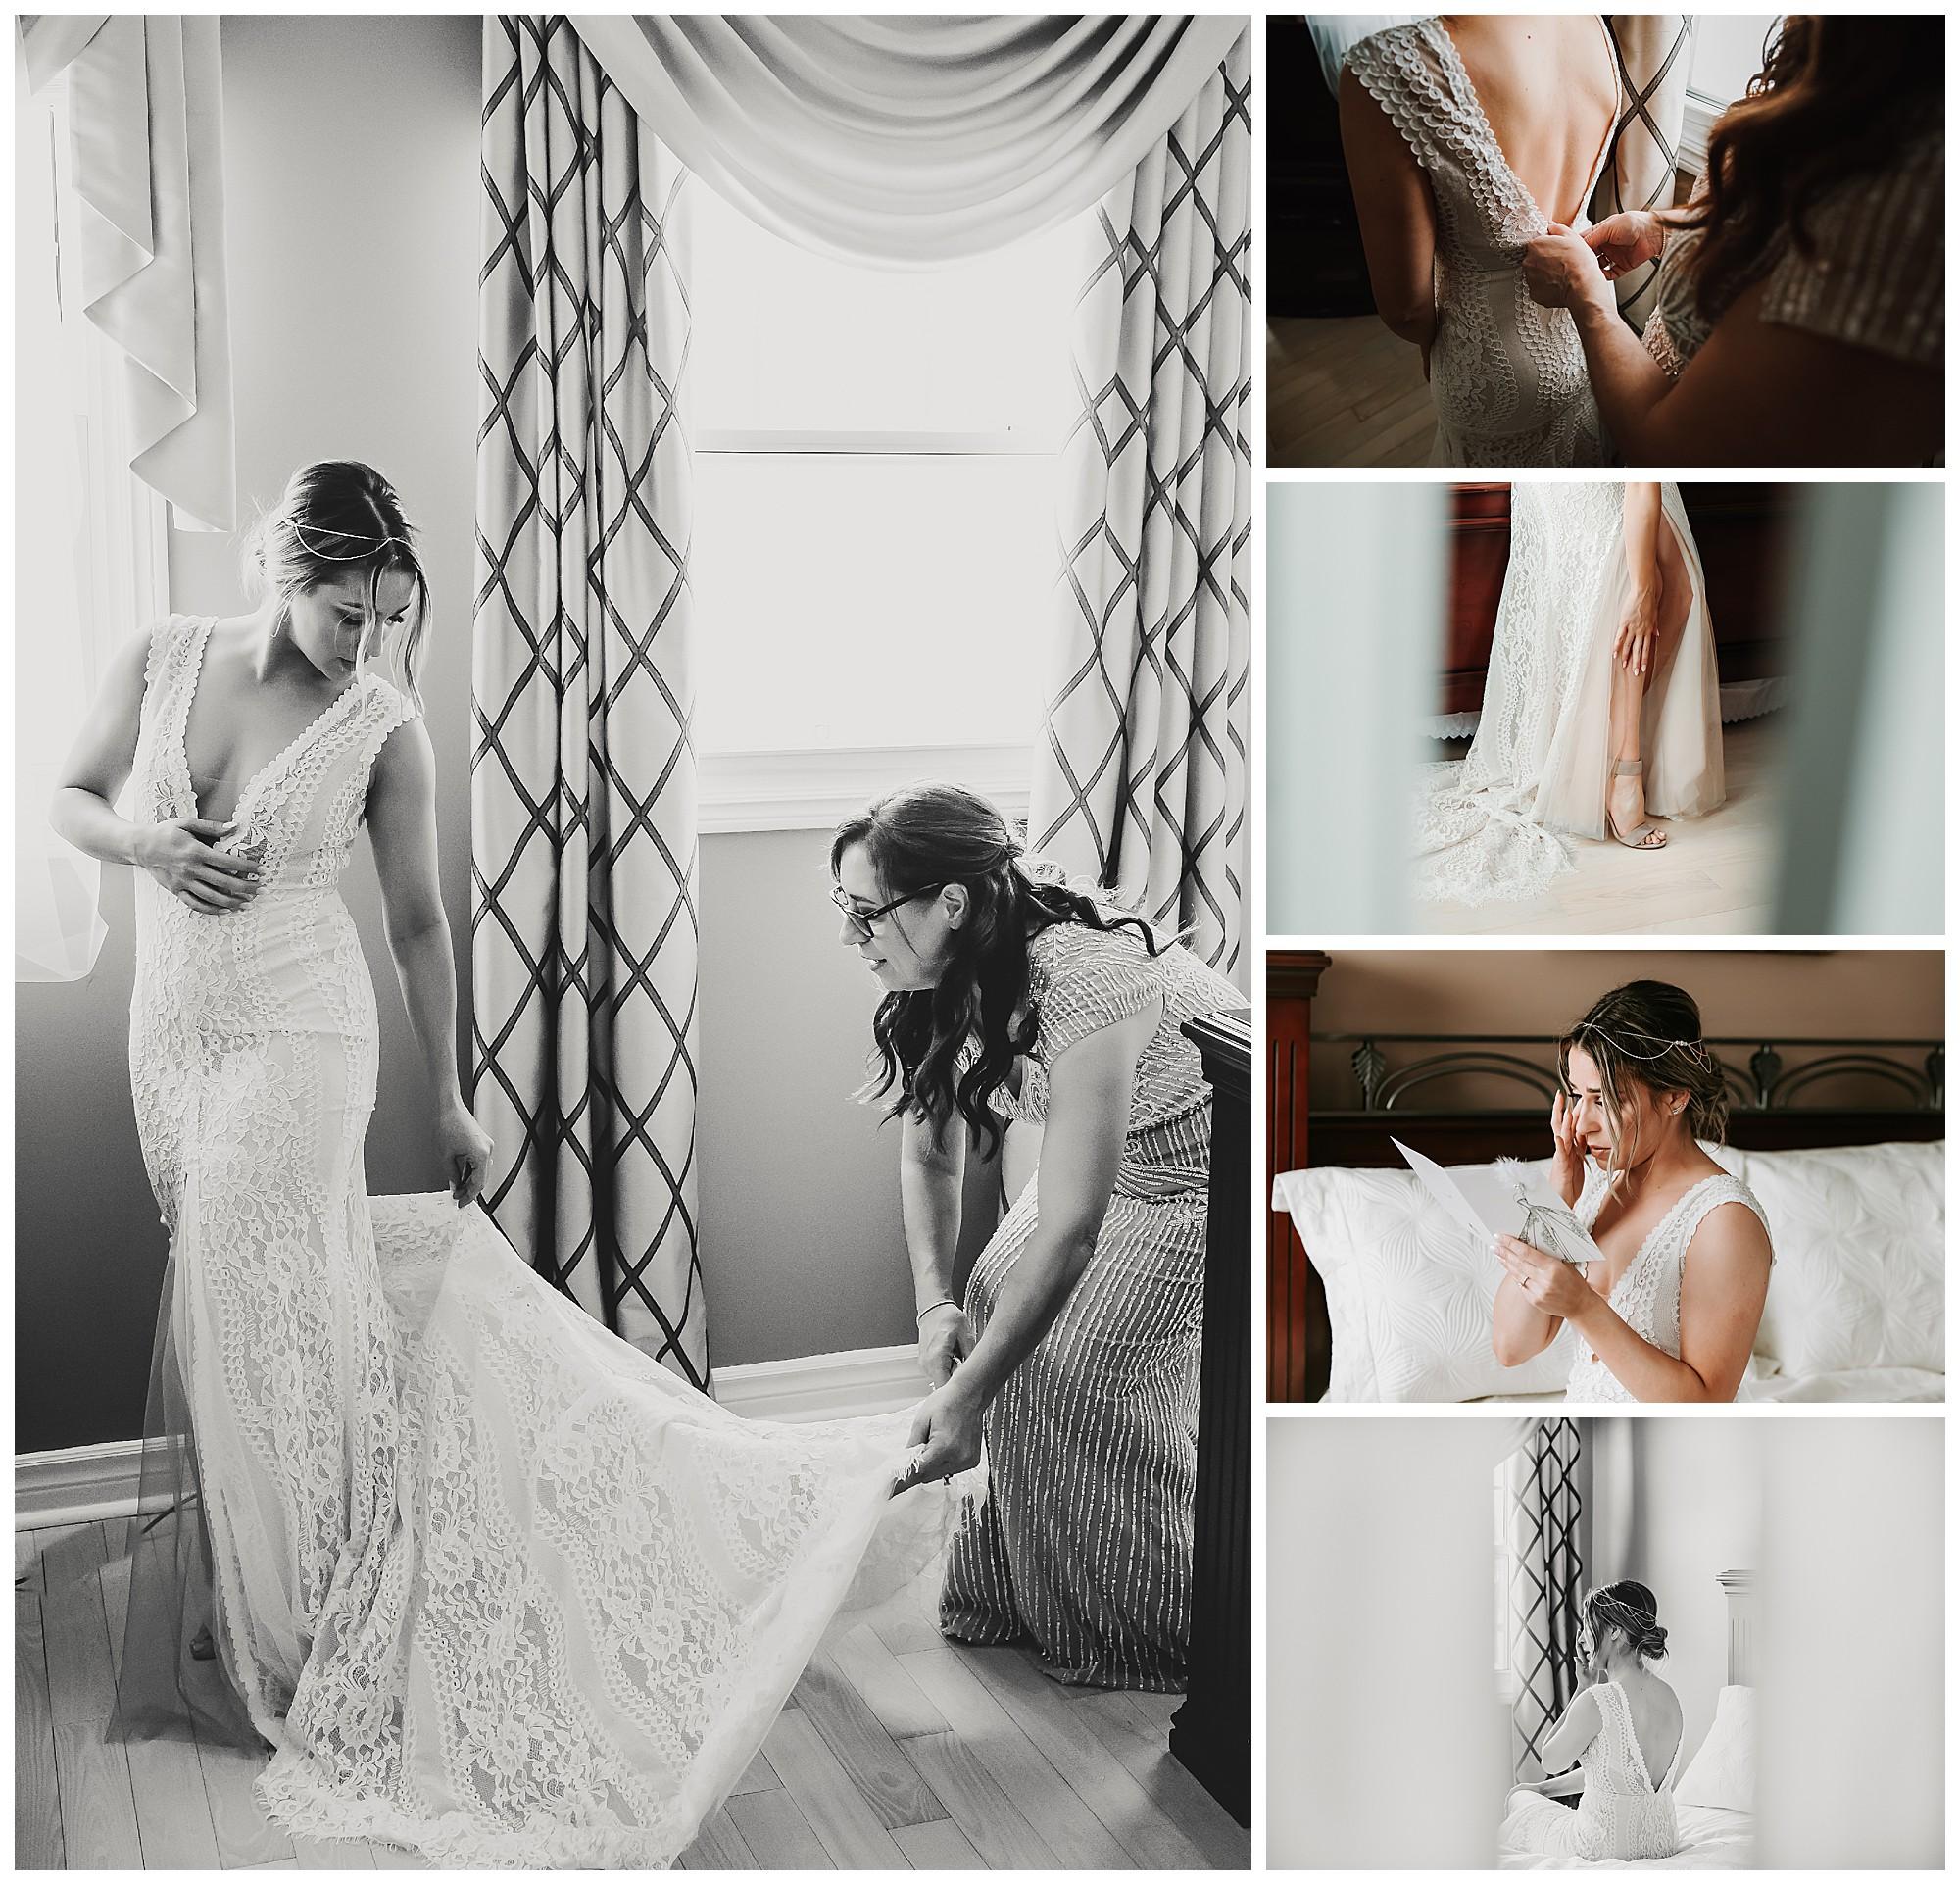 Joanna-Christos-Grand-Luxe-Wedding-Photos-Mint-Room-Toronto-VanDaele-Russell_0062.jpg